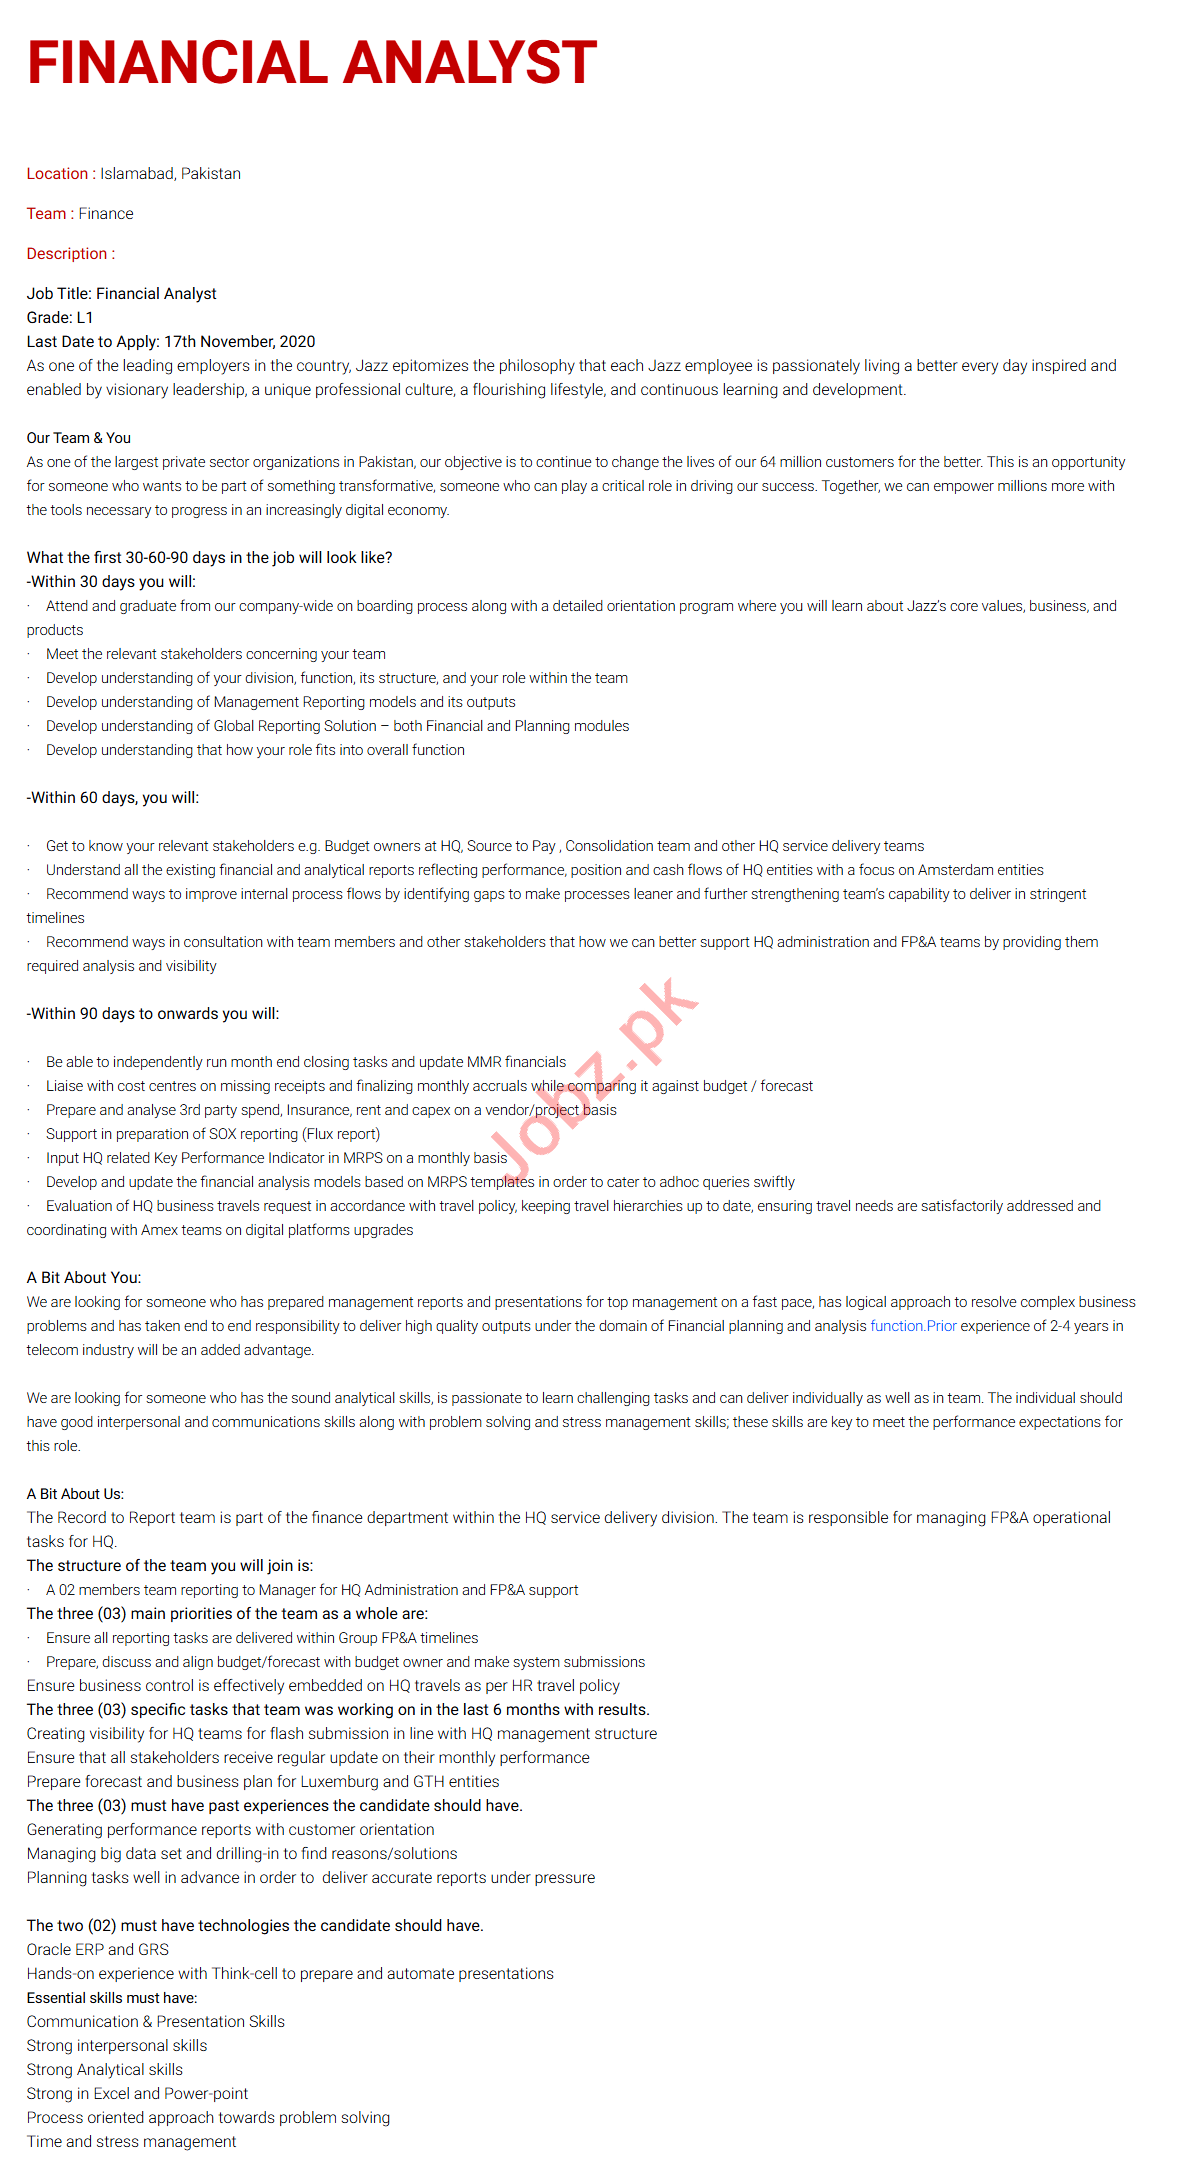 Financial Analyst Jobs 2020 in Islamabad